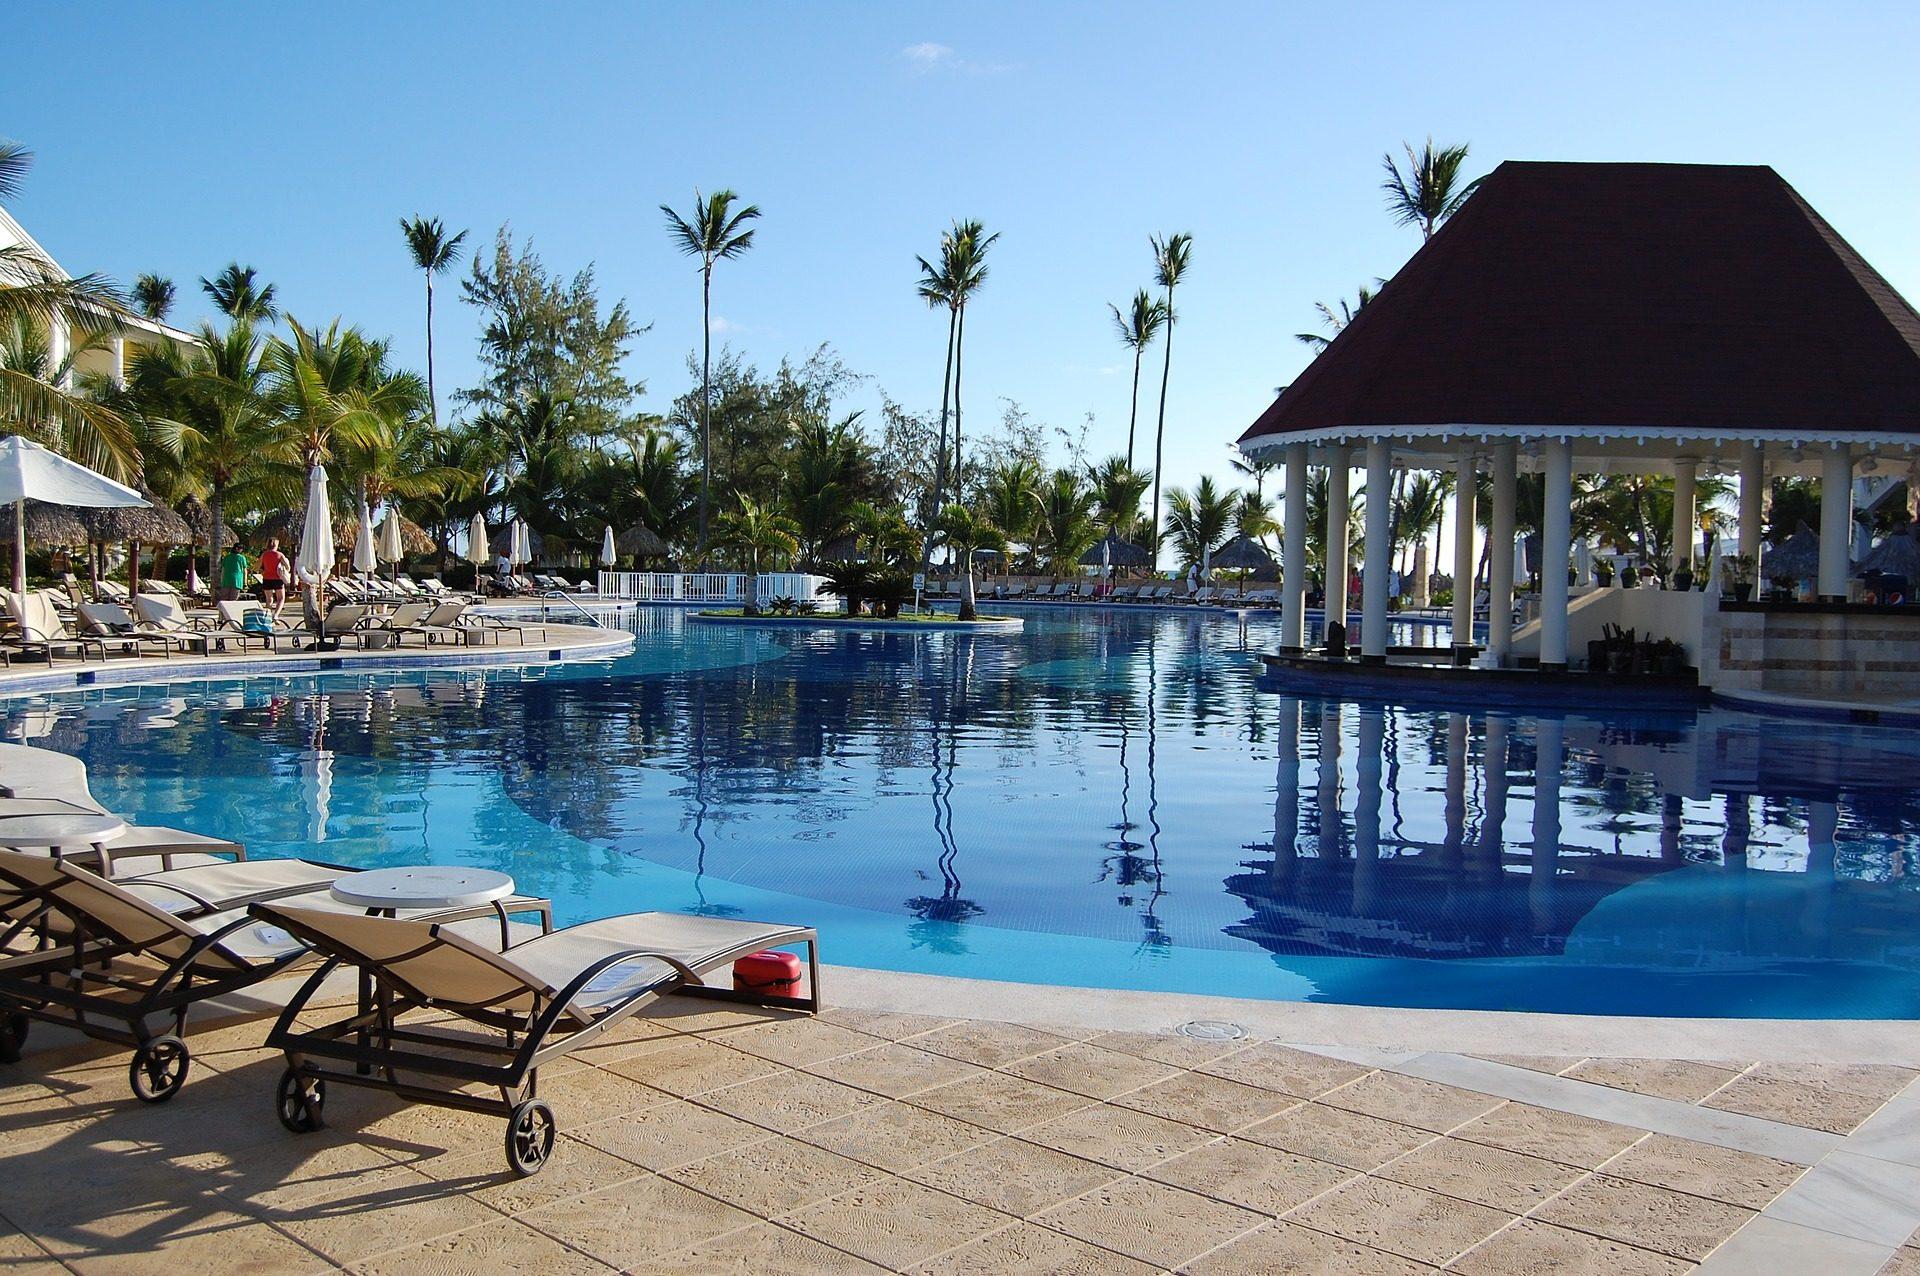 hotel, resort, viaje, piscina, hamacas, descanso, relax, república dominicana - Fondos de Pantalla HD - professor-falken.com